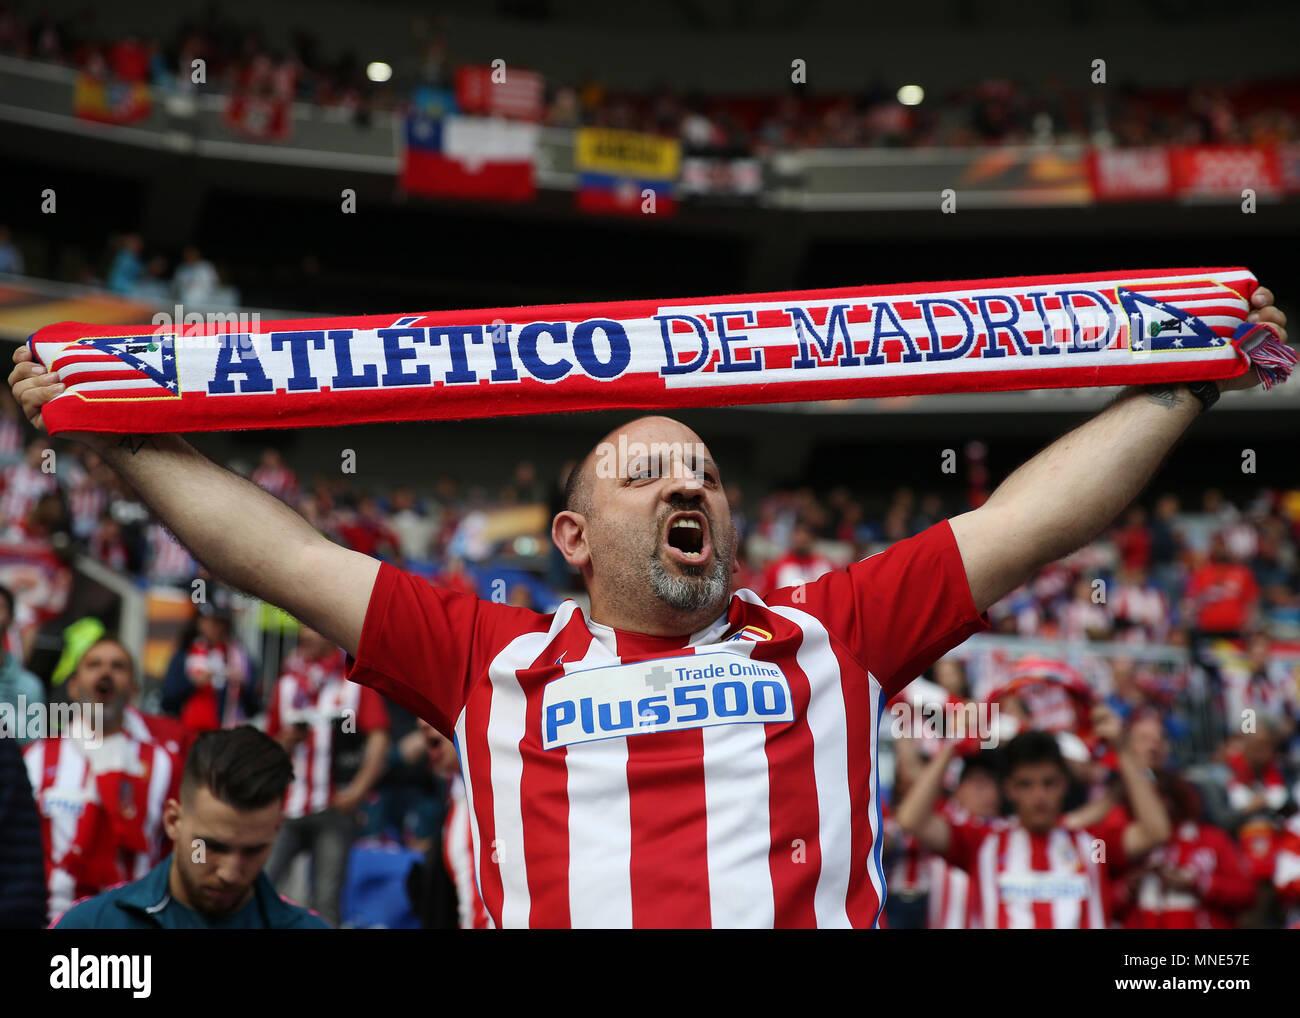 Atletico Madrid La Liga Football Crest Fans Scarf